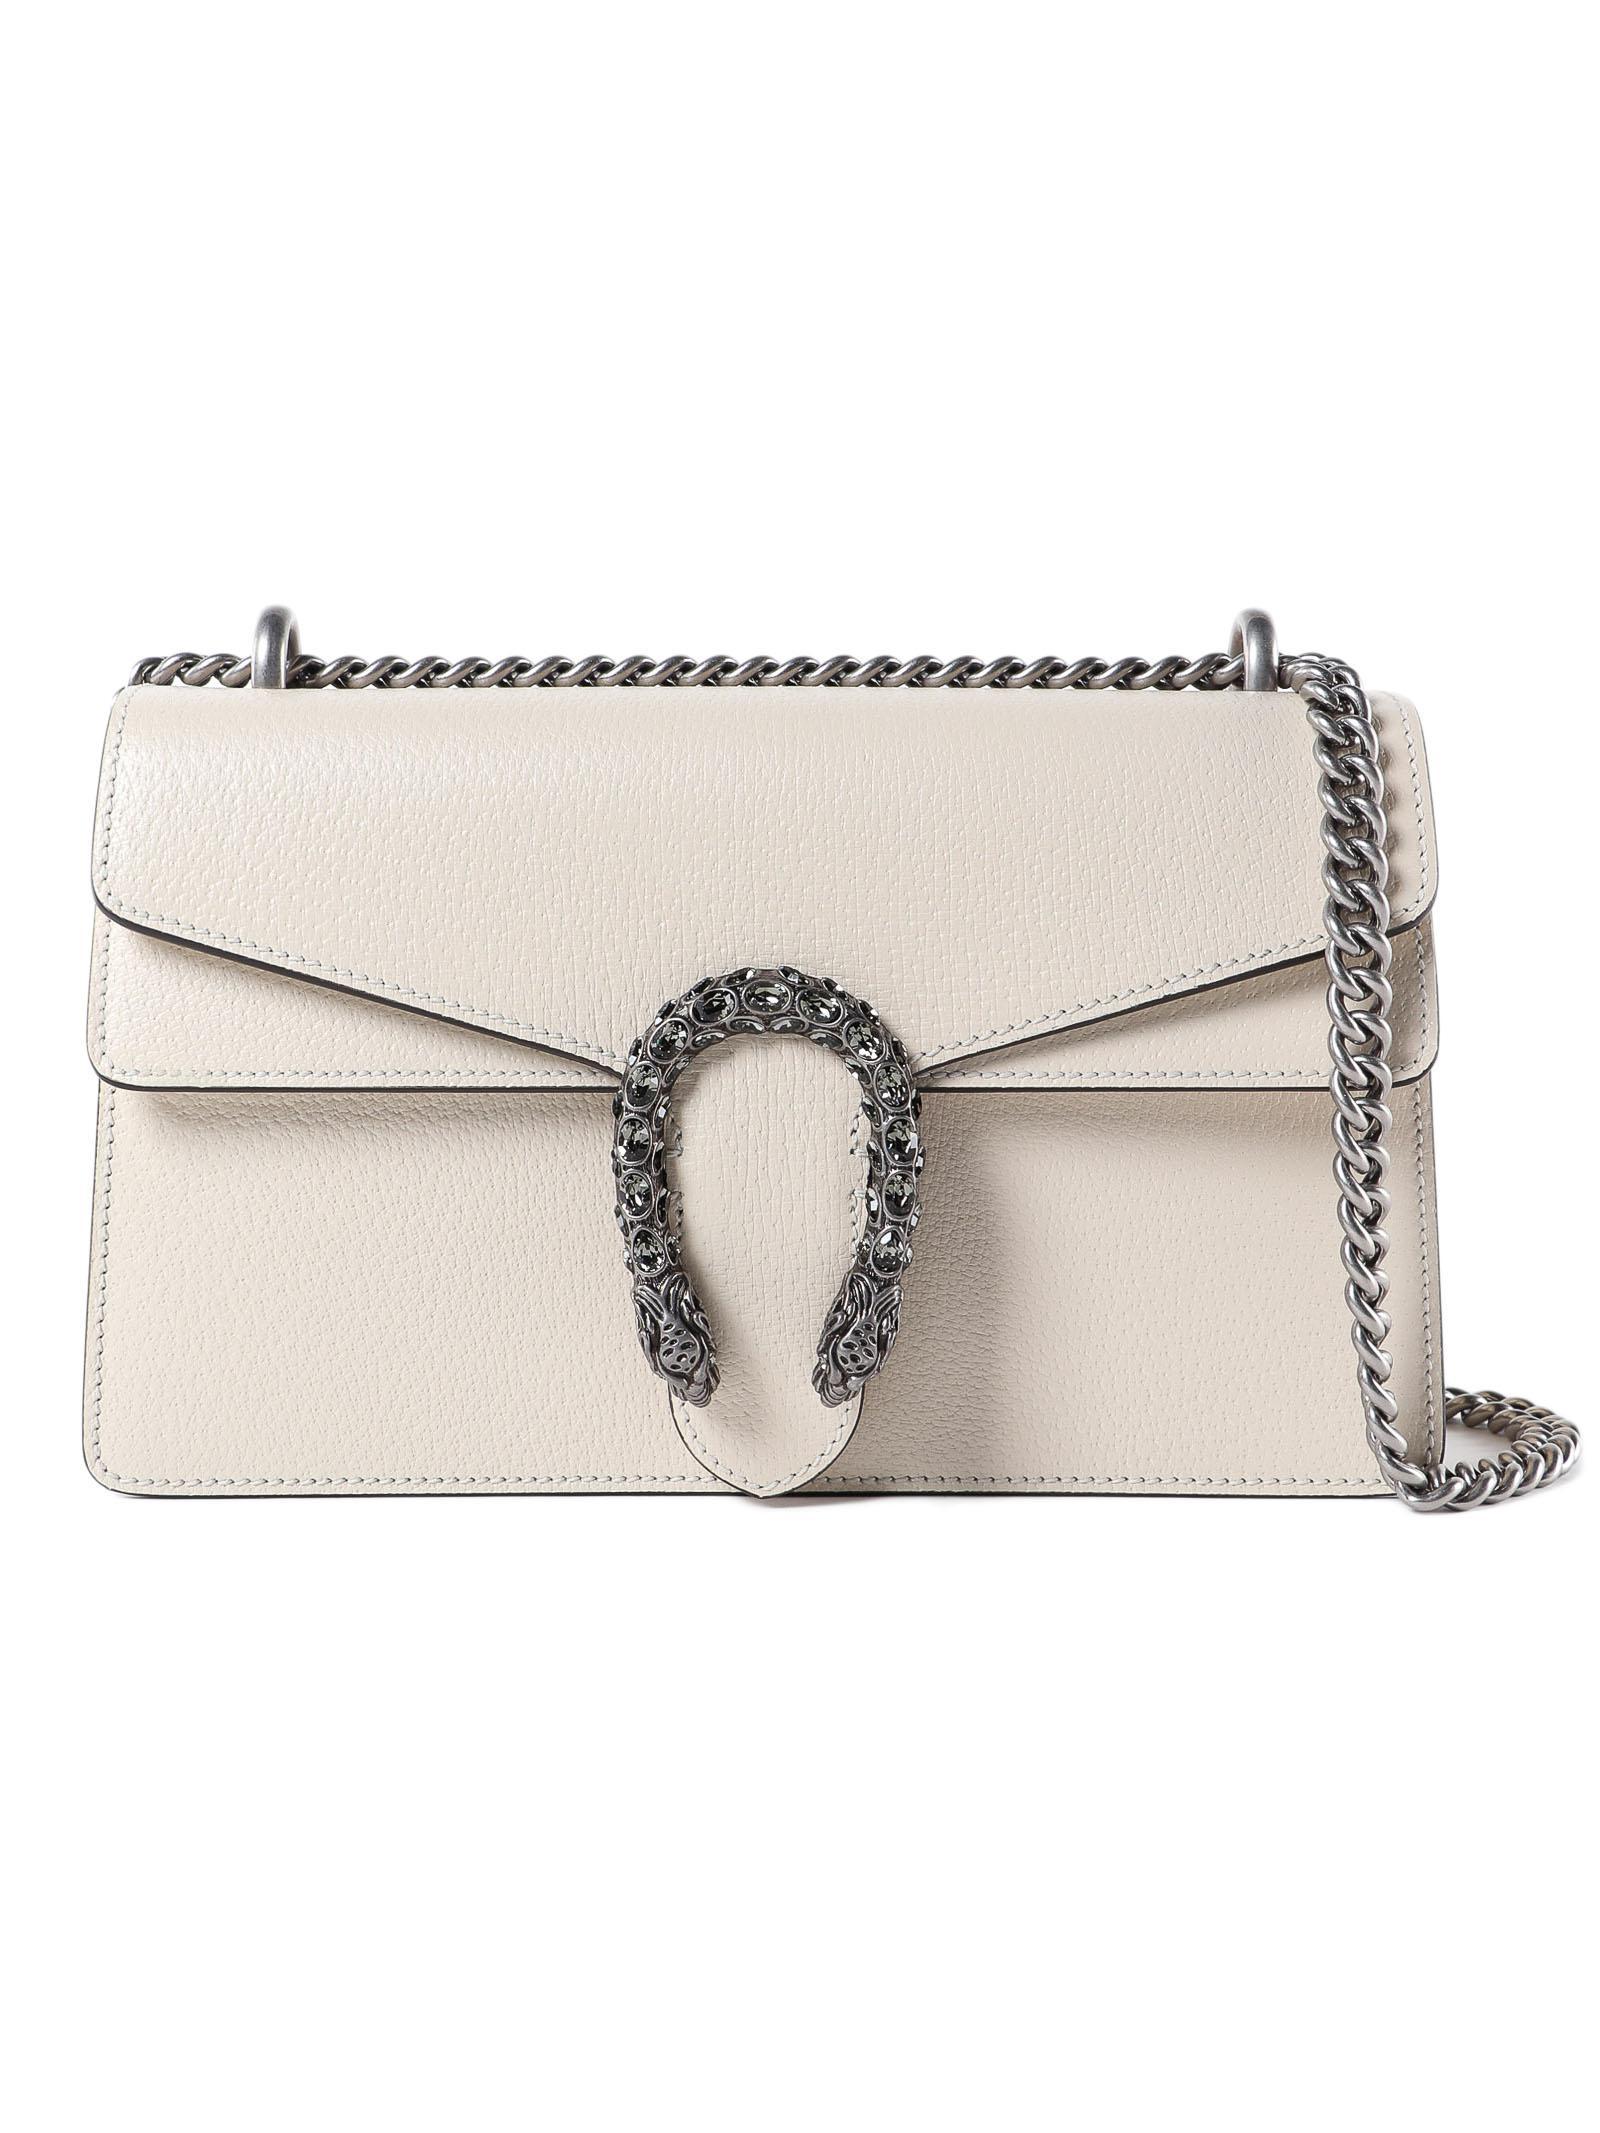 eaacc053e3b Gucci. Women s Dionysus Bag